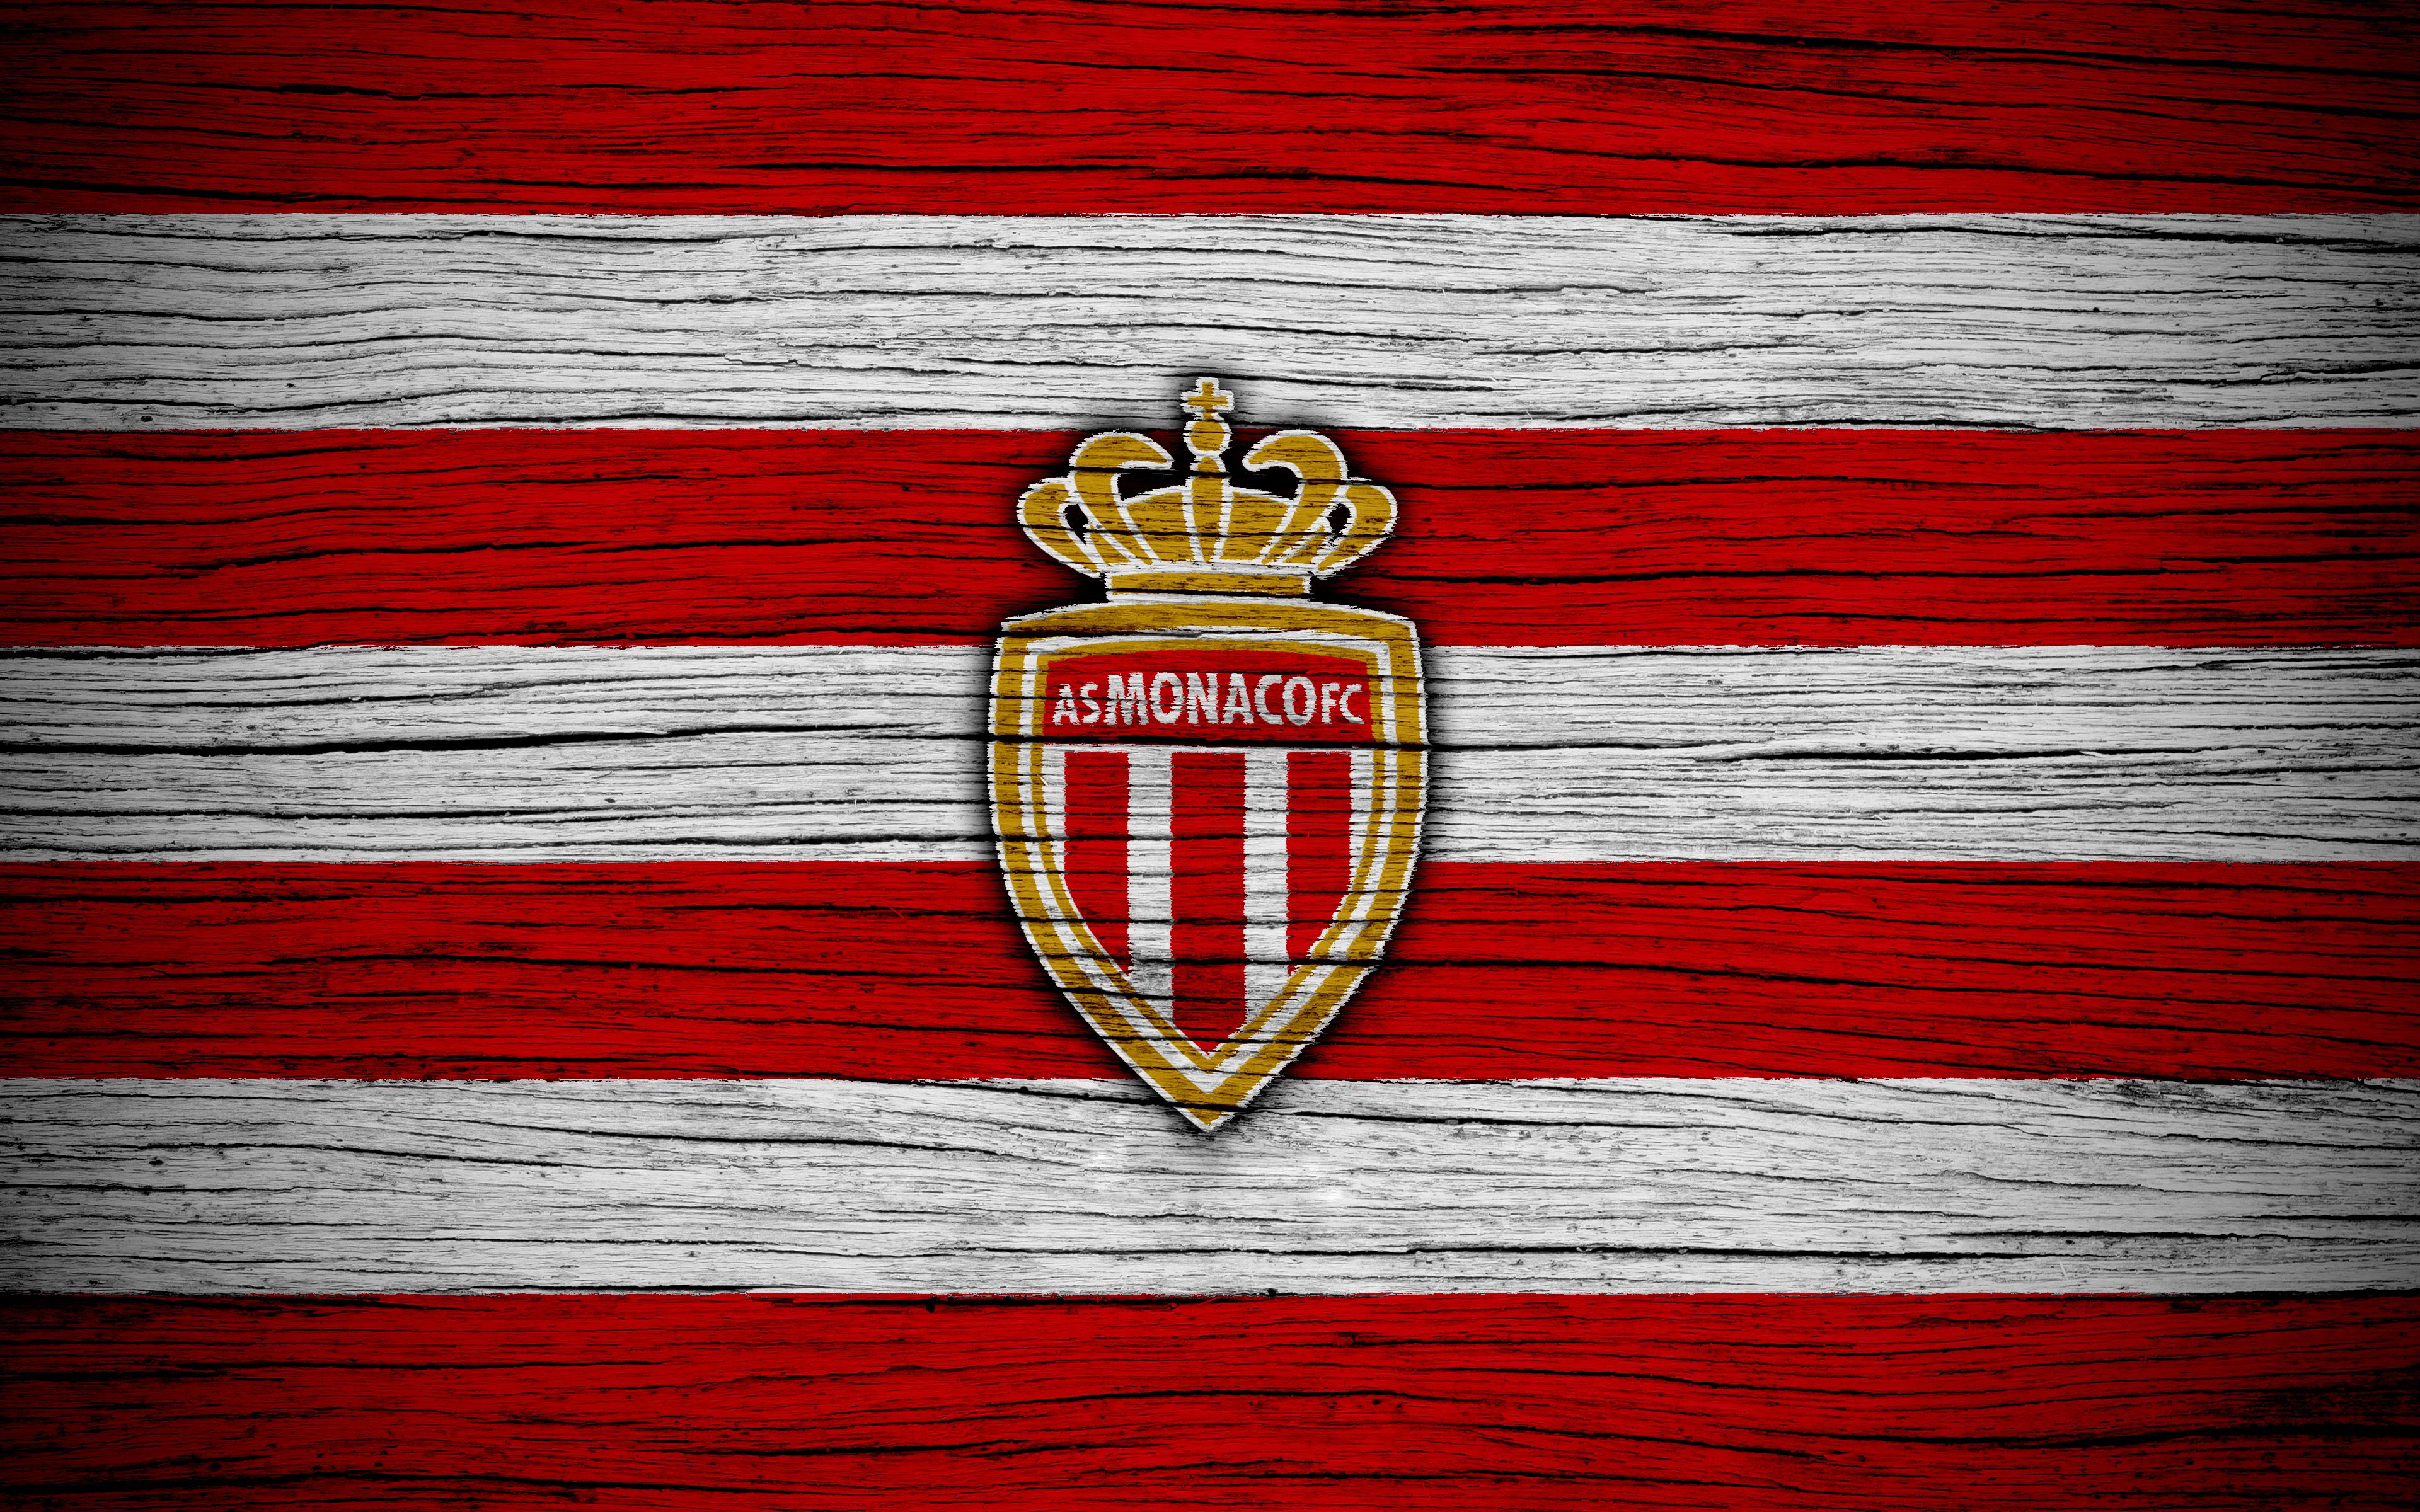 AS Monaco FC 4k Ultra HD Wallpaper Background Image 3840x2400 3840x2400